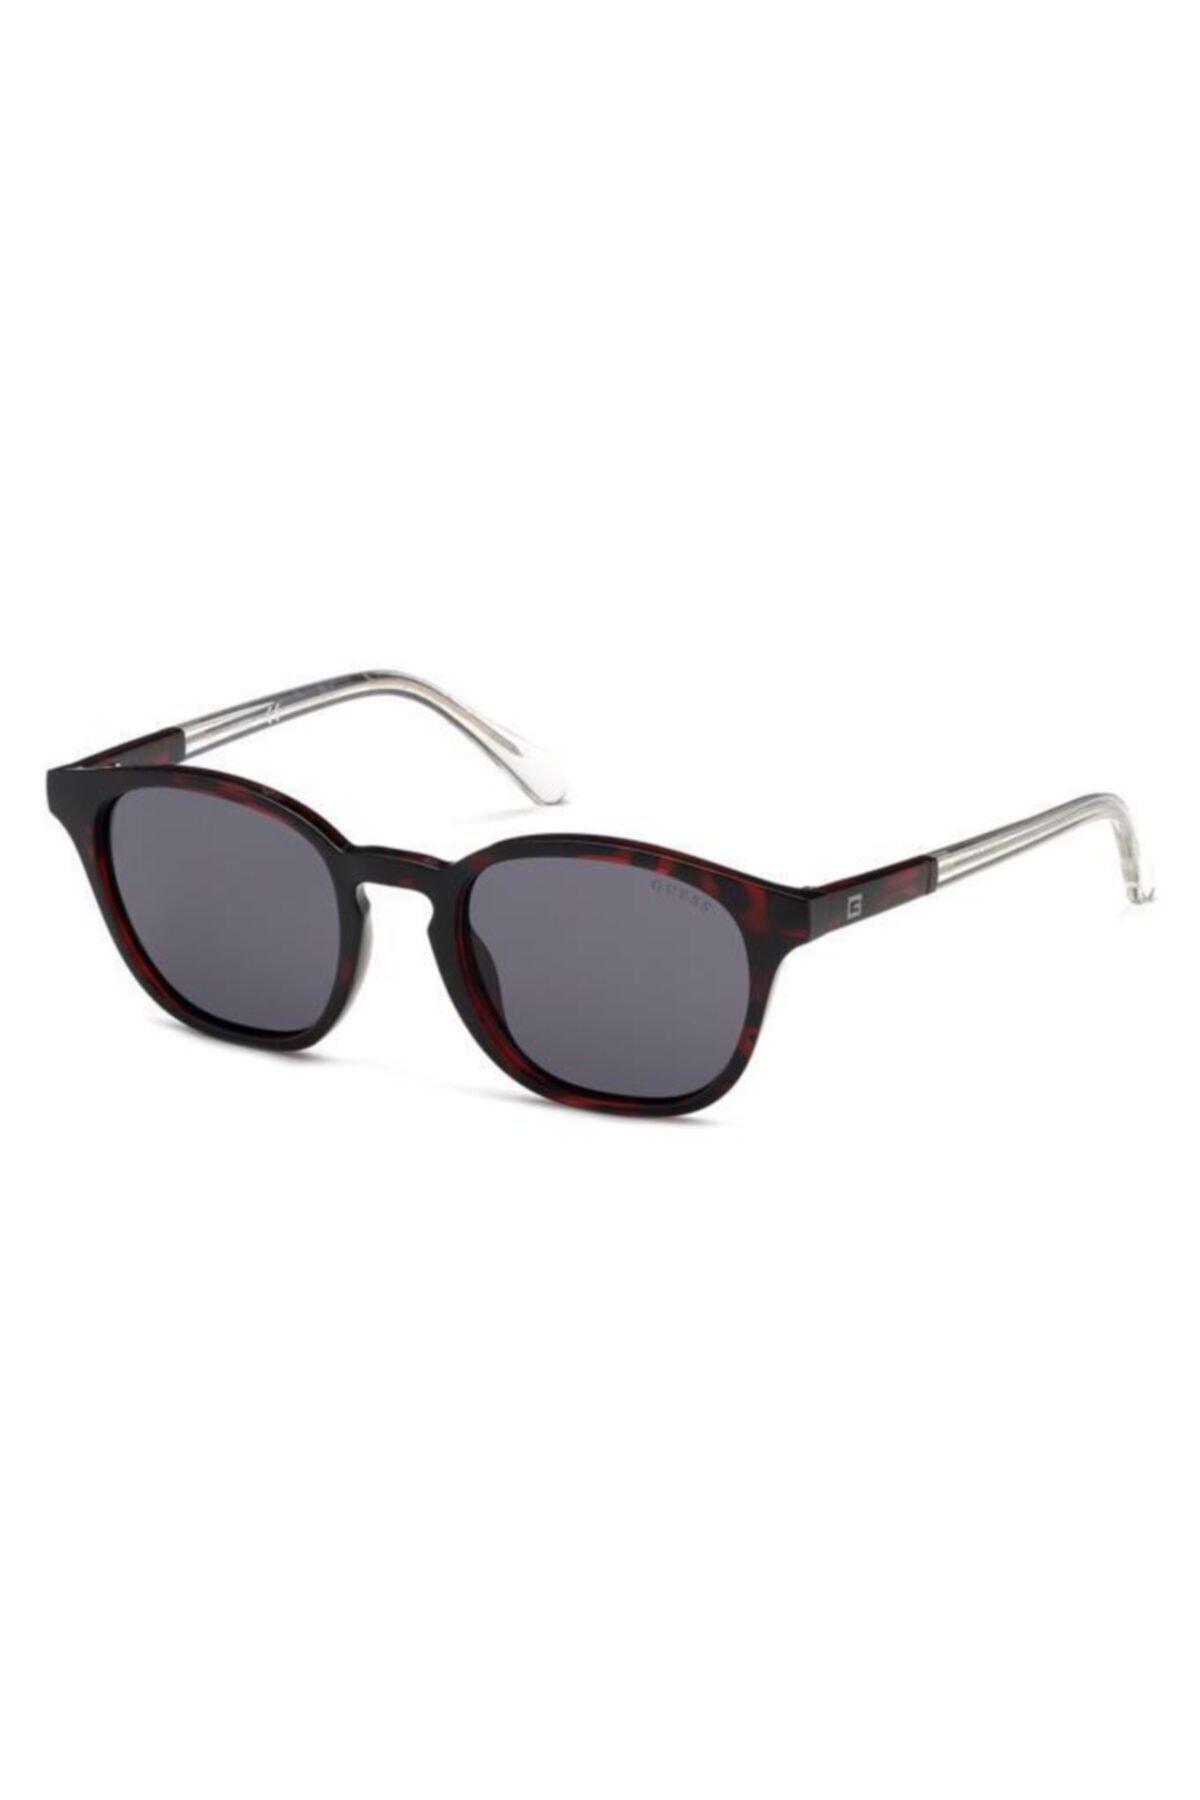 فروش عینک دودی اسپرت  برند Guess رنگ زرشکی ty73245230